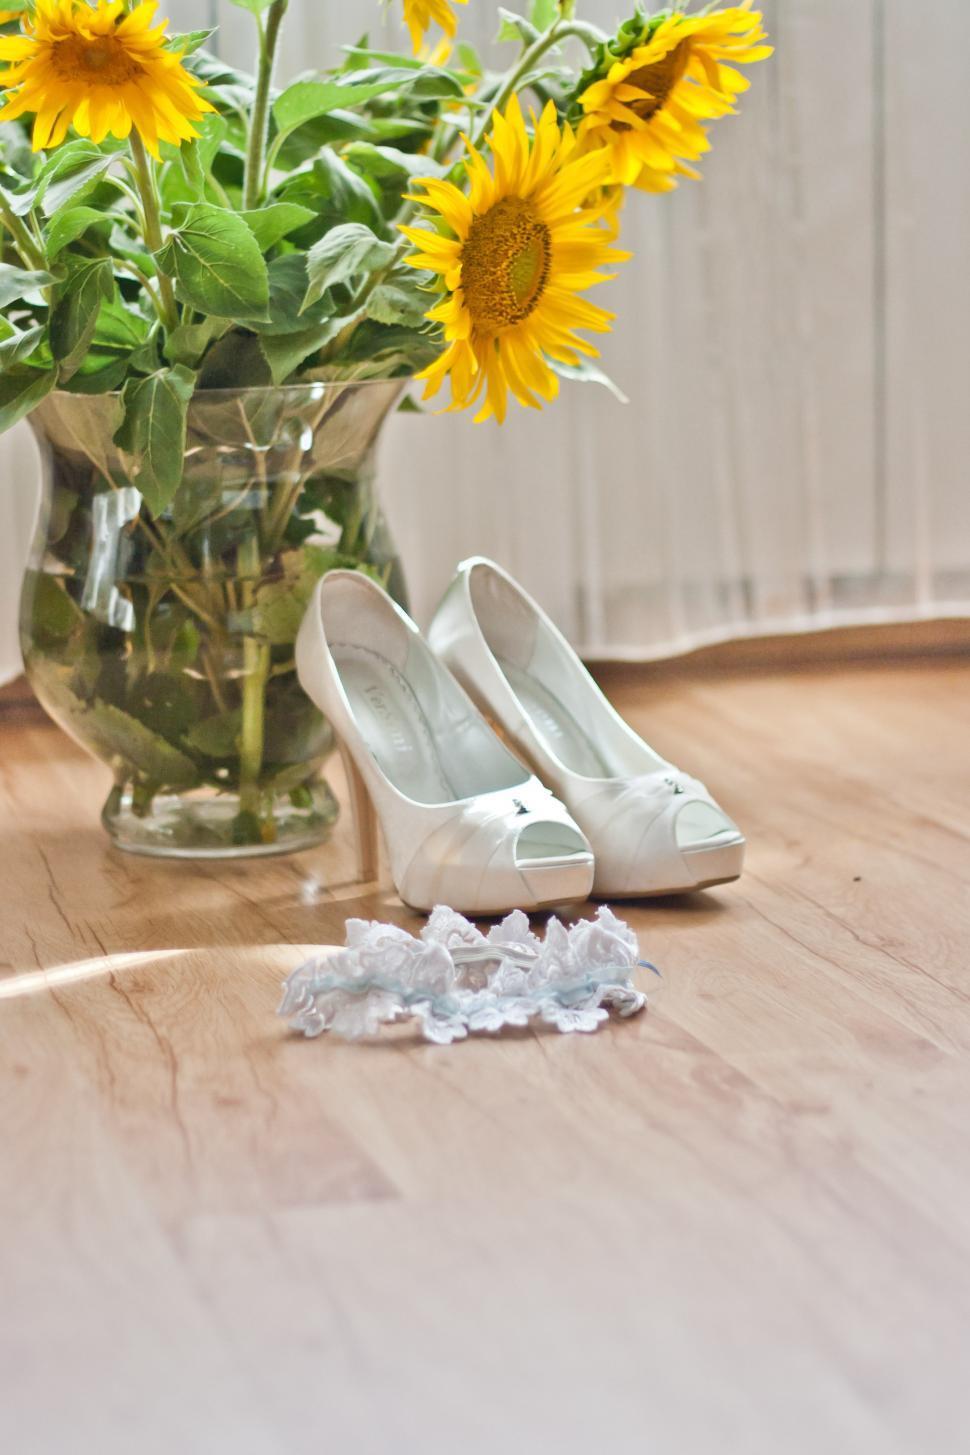 Download Free Stock Photo of flowers garter higheels shoes sunflower wedding